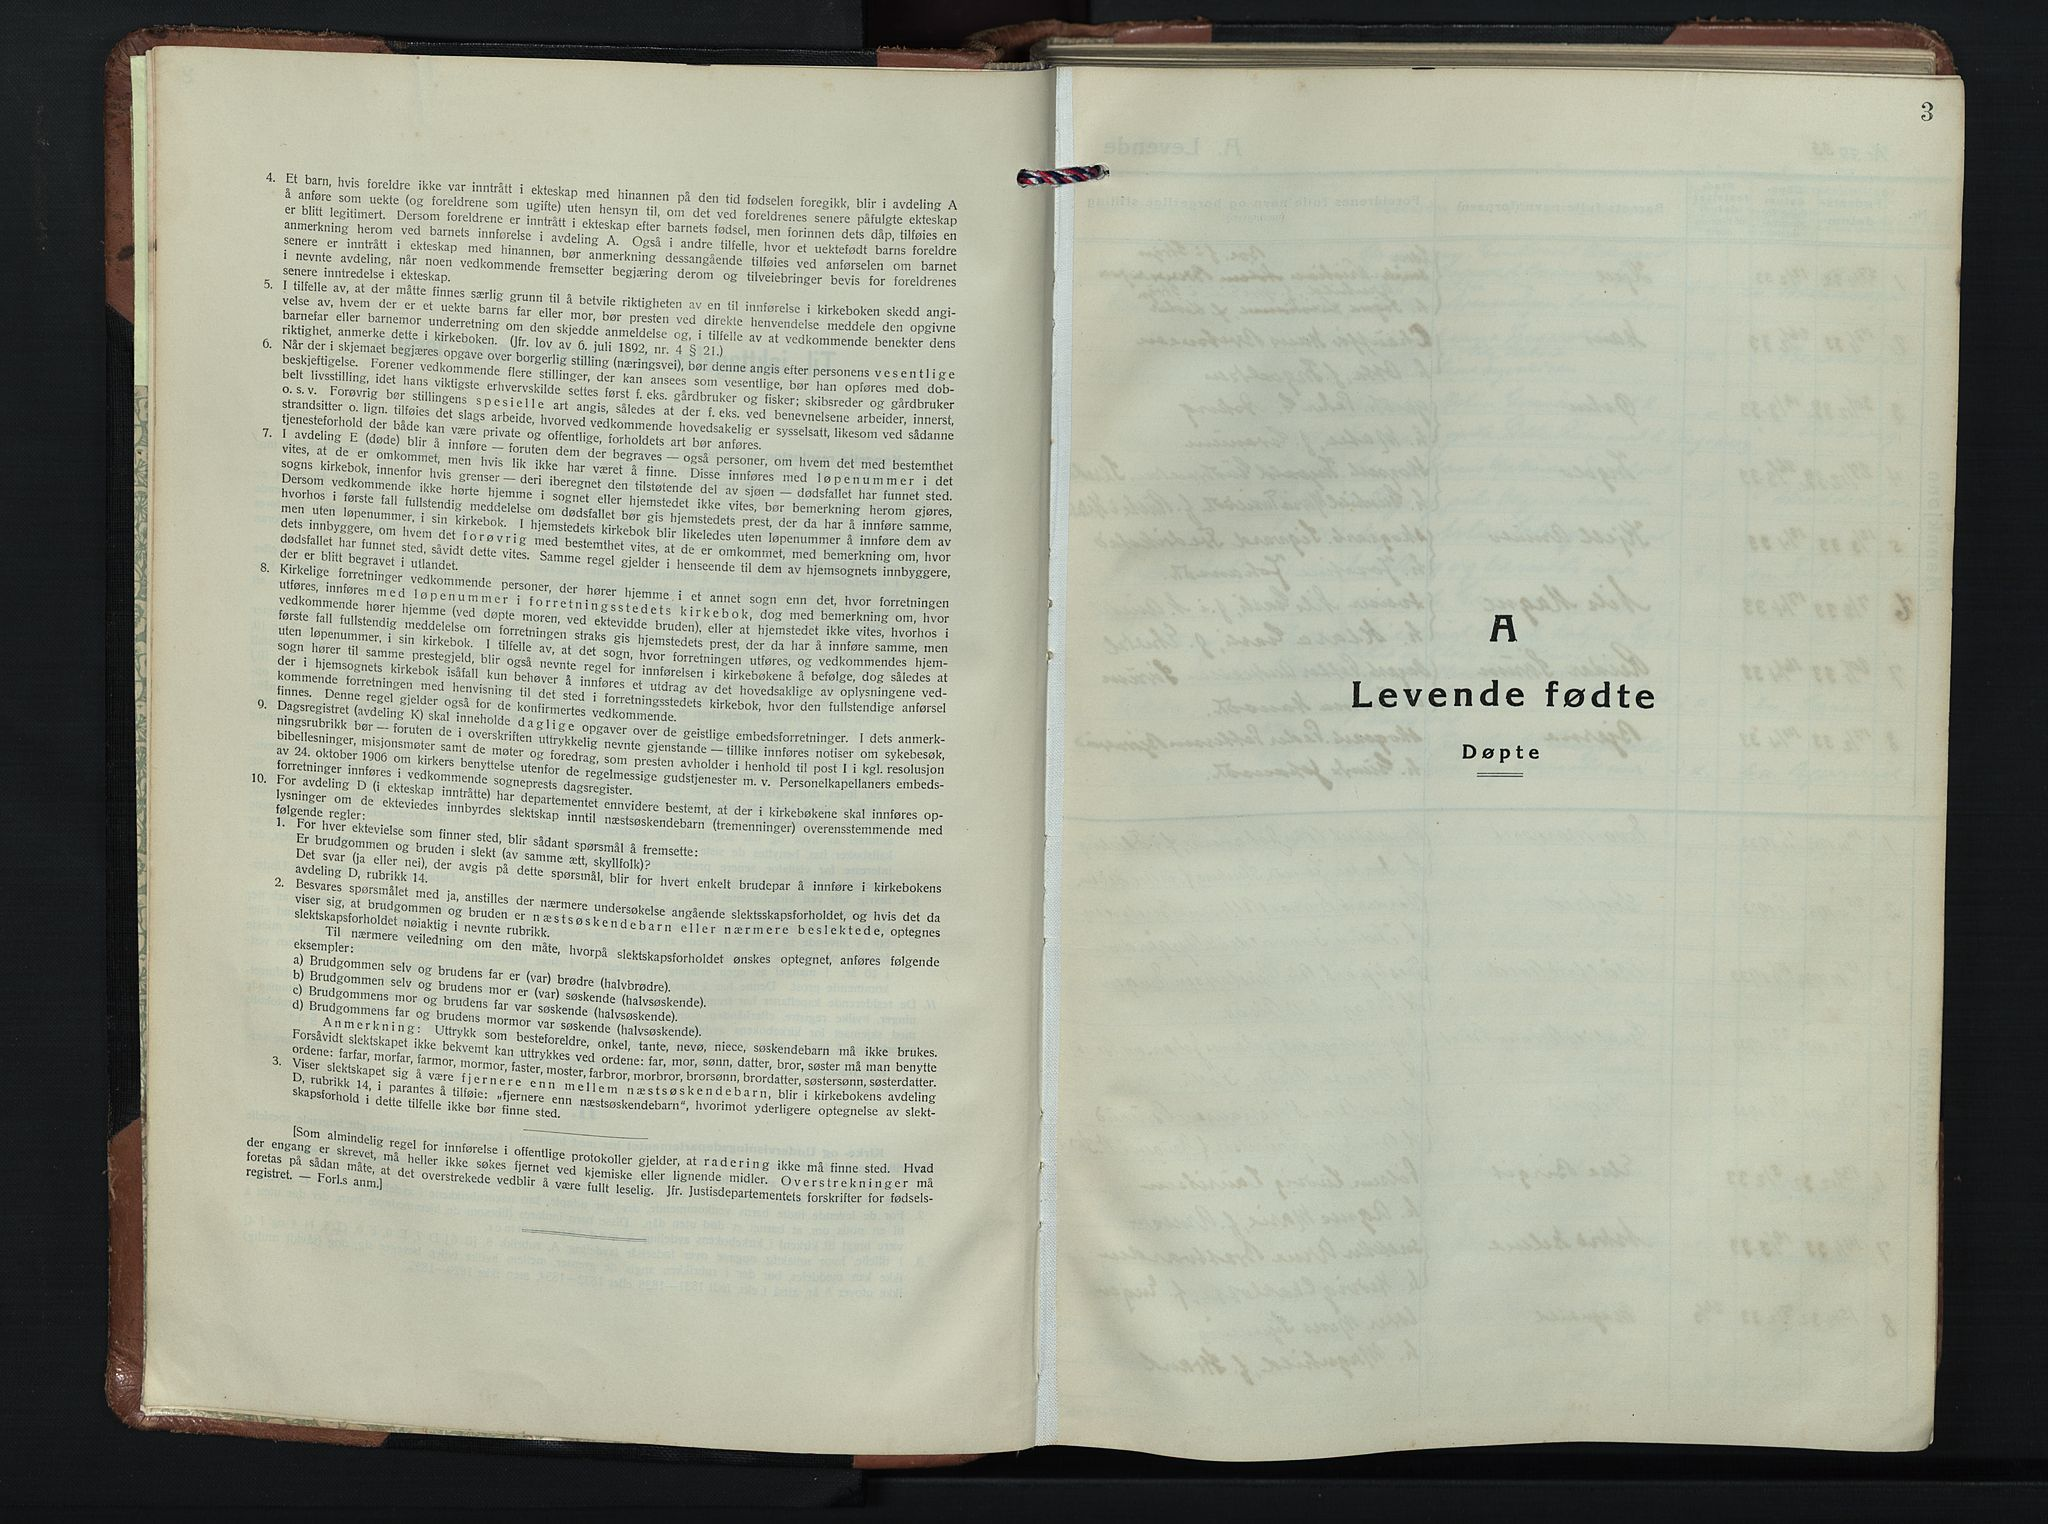 SAH, Søndre Land prestekontor, L/L0009: Klokkerbok nr. 9, 1933-1954, s. 3